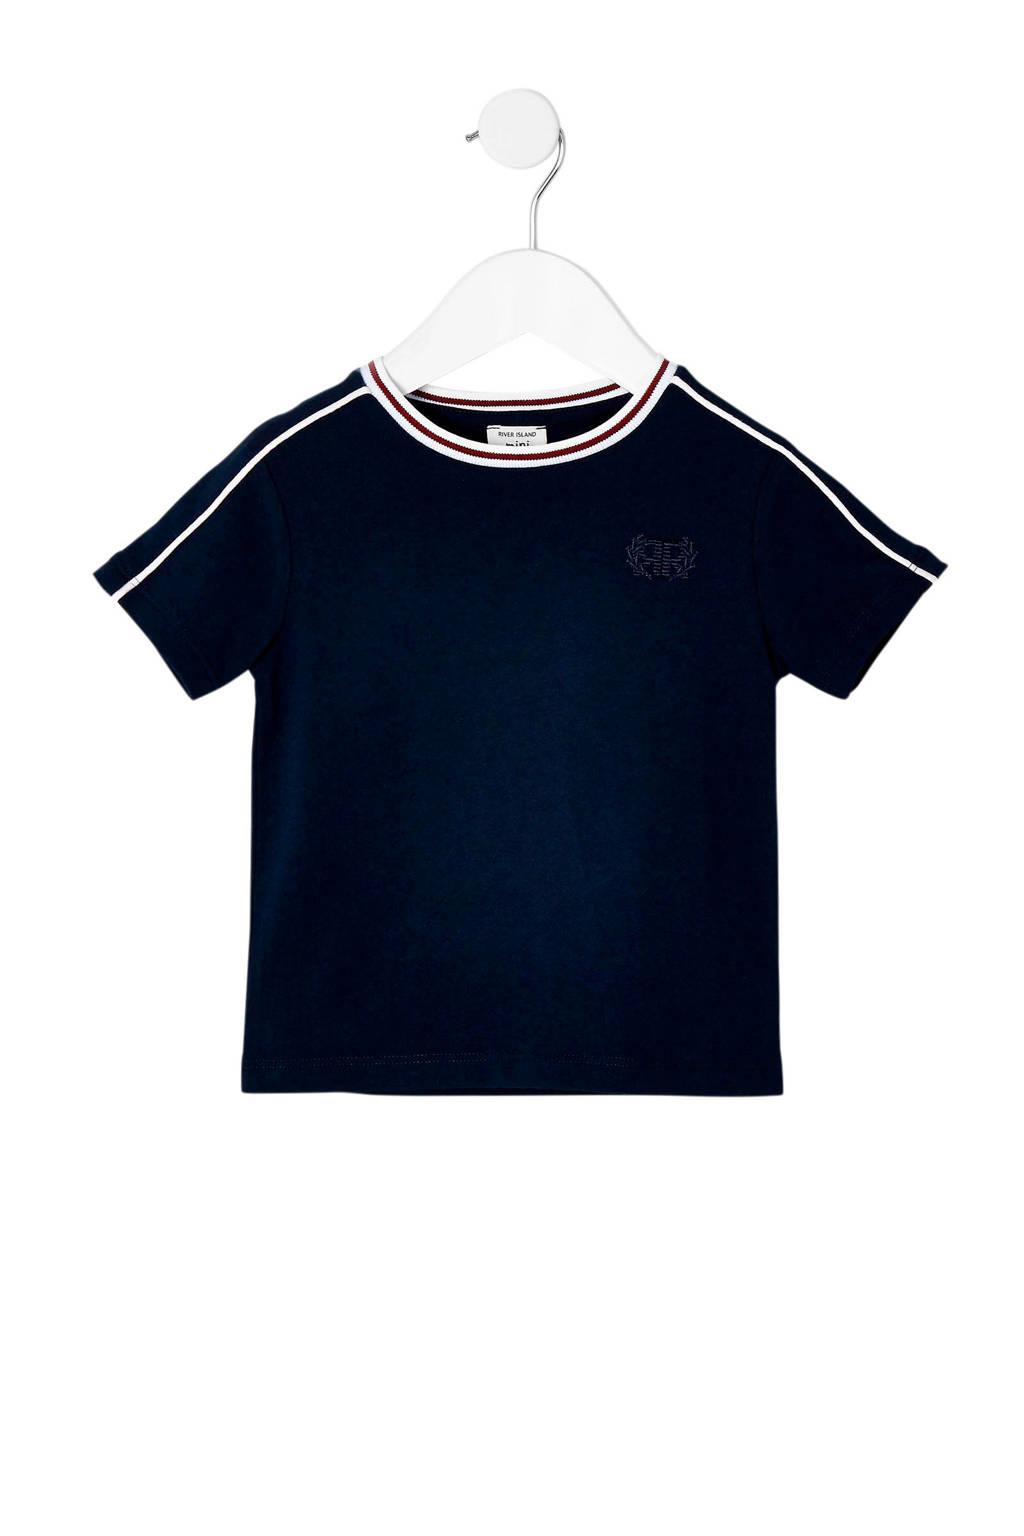 River Island T-shirt met contrastbies donkerblauw, Donkerblauw